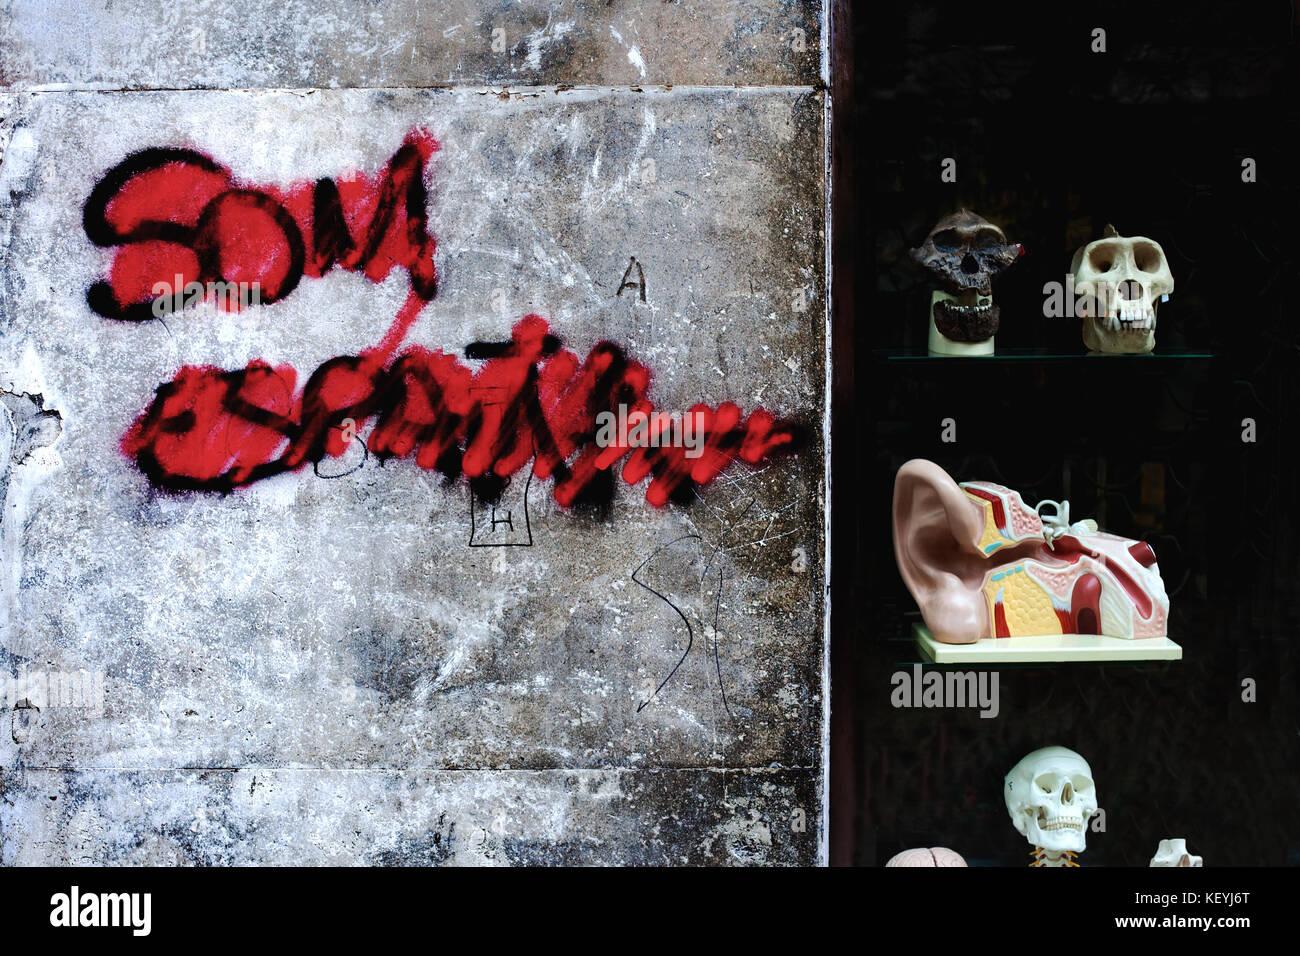 We are spain graffiti barcelona spain stock image